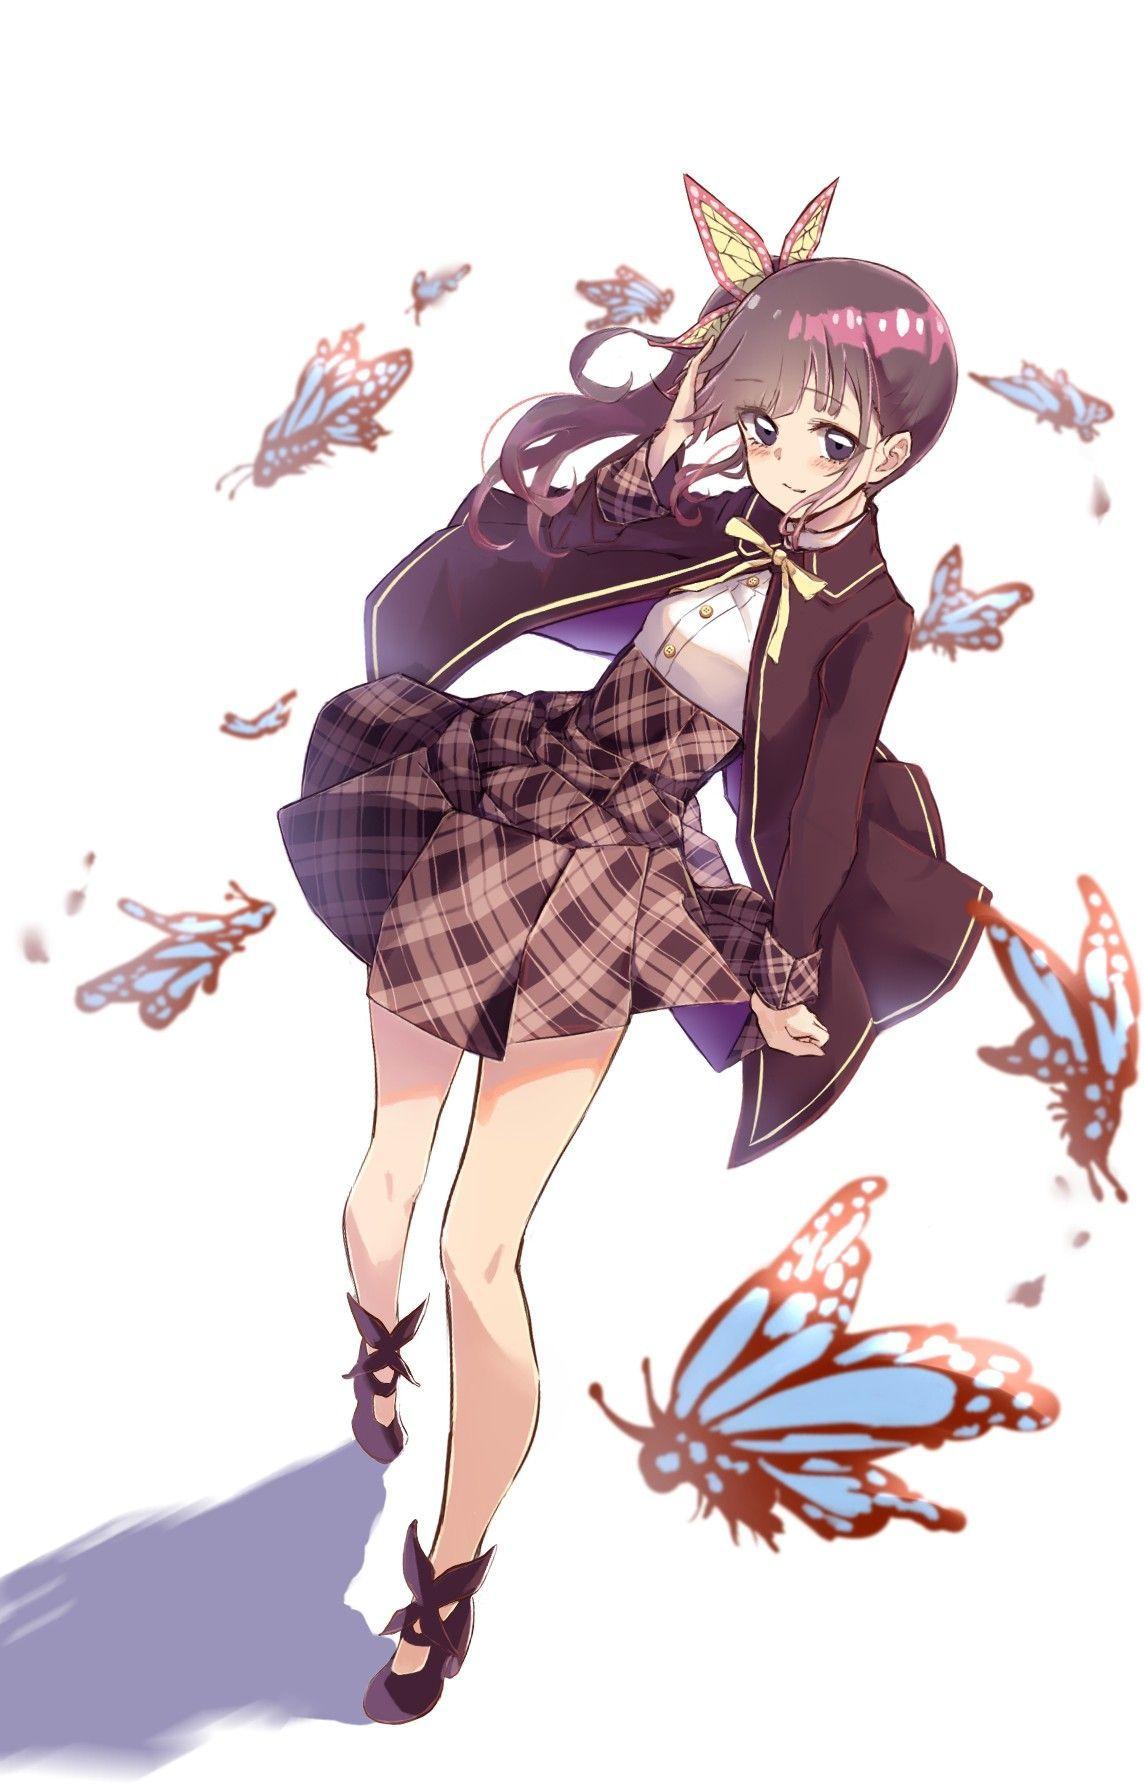 Save & Follow Riku in 2020 Anime hintergründe, Anime